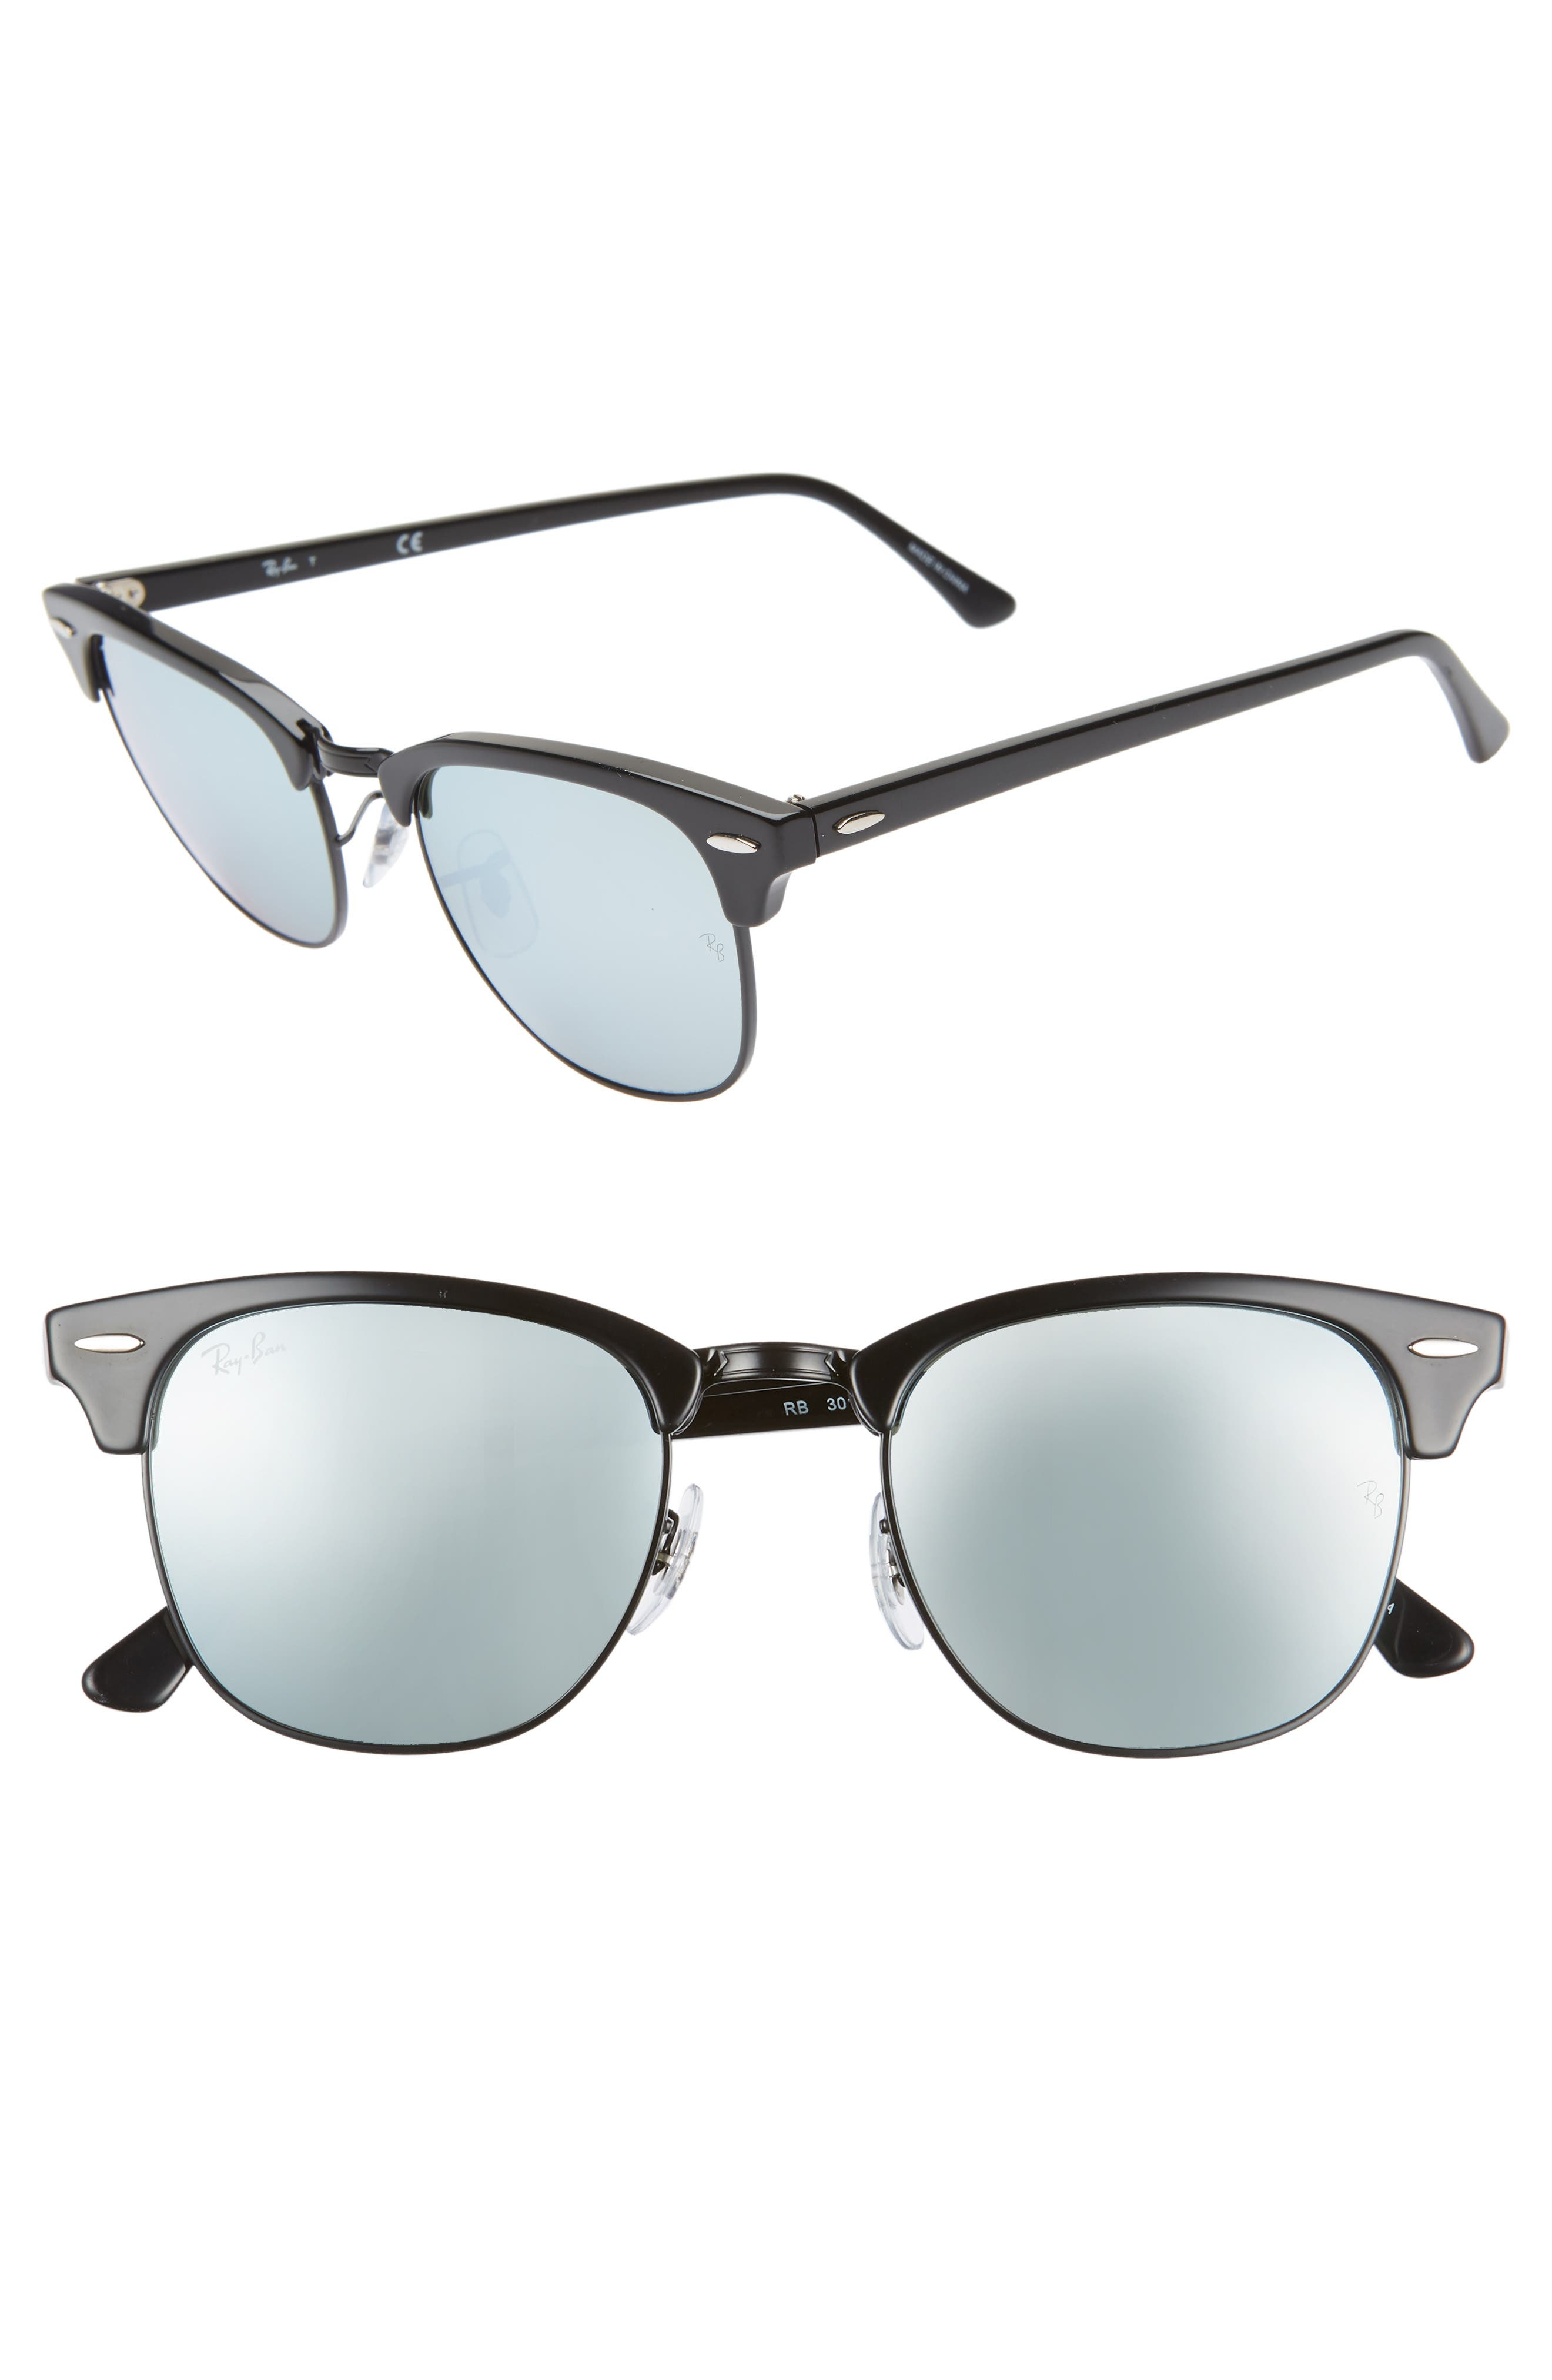 RAY-BAN,                             Standard Clubmaster 51mm Sunglasses,                             Main thumbnail 1, color,                             BLACK/ BLUE MIRROR